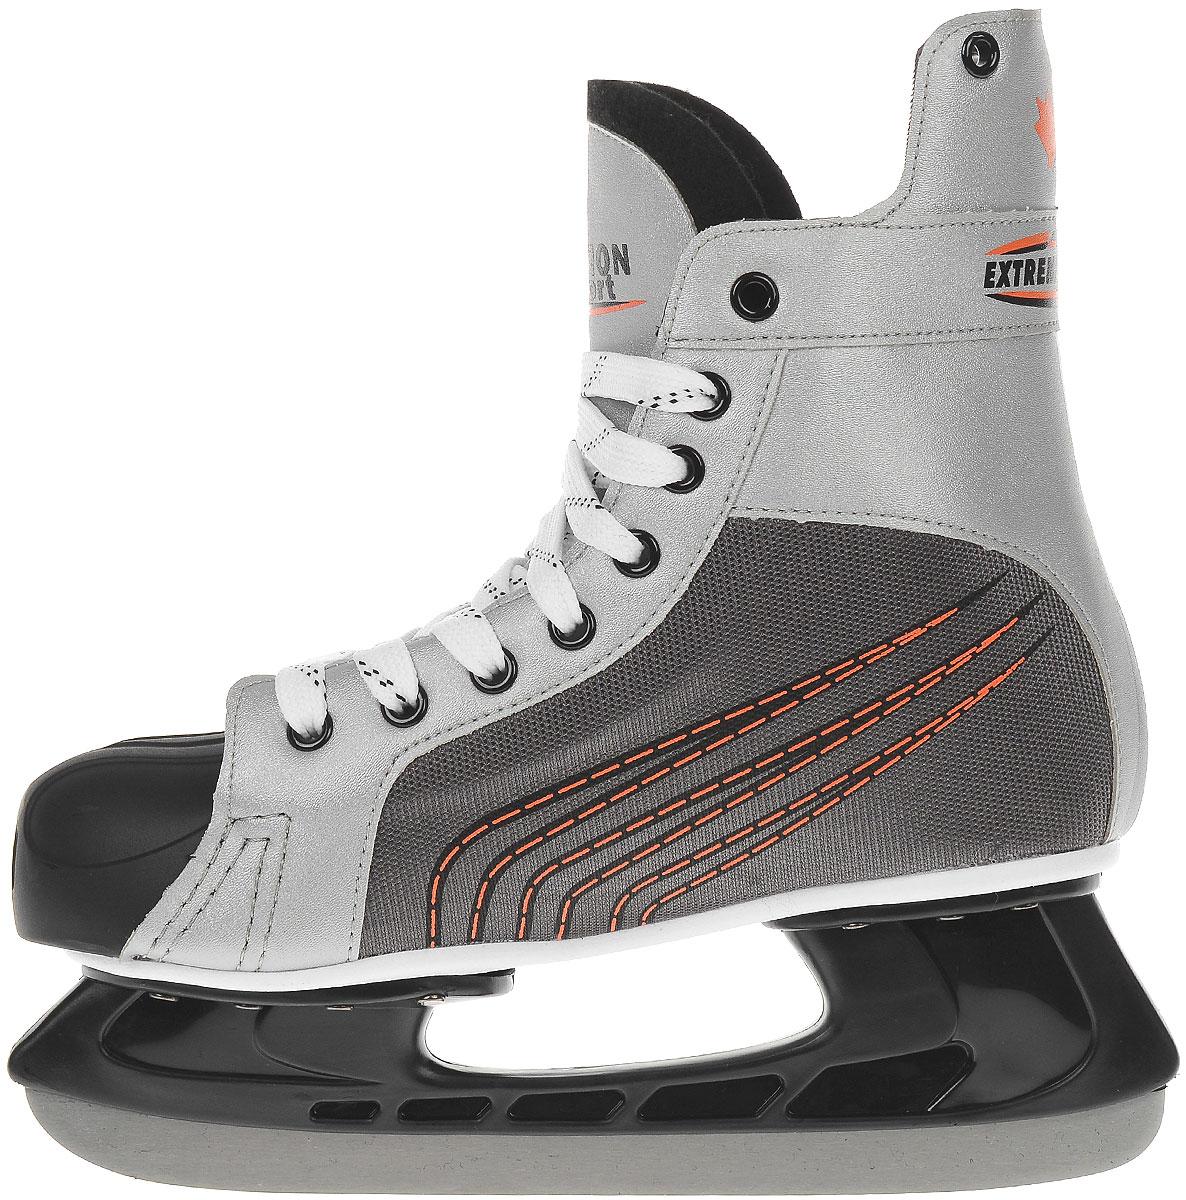 Коньки хоккейные мужские Action, цвет: белый, серый. PW-216N. Размер 44